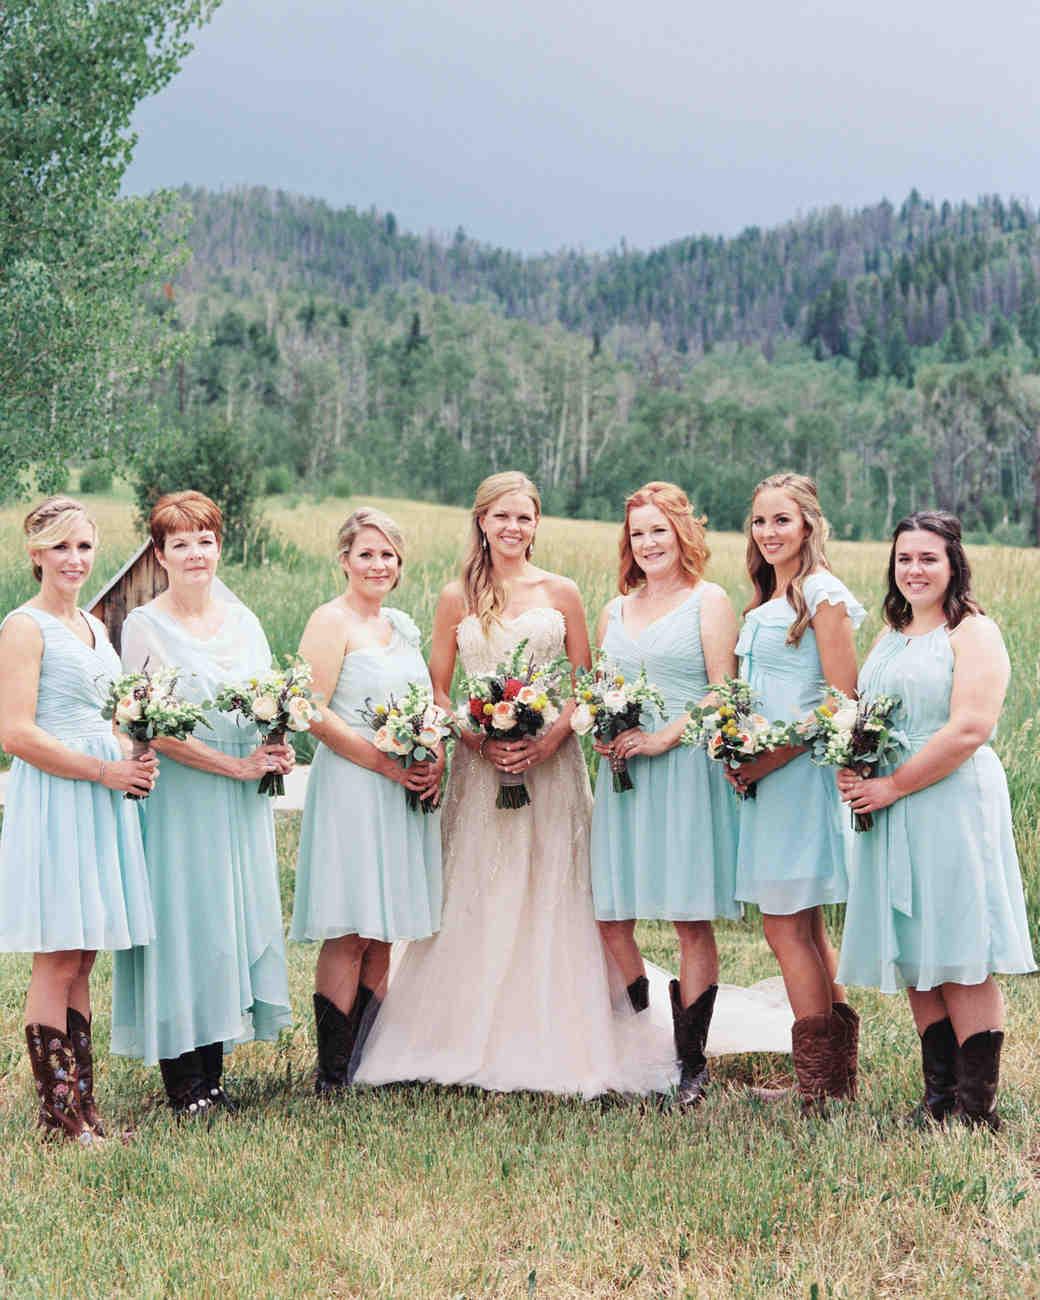 fuck Brides party wants